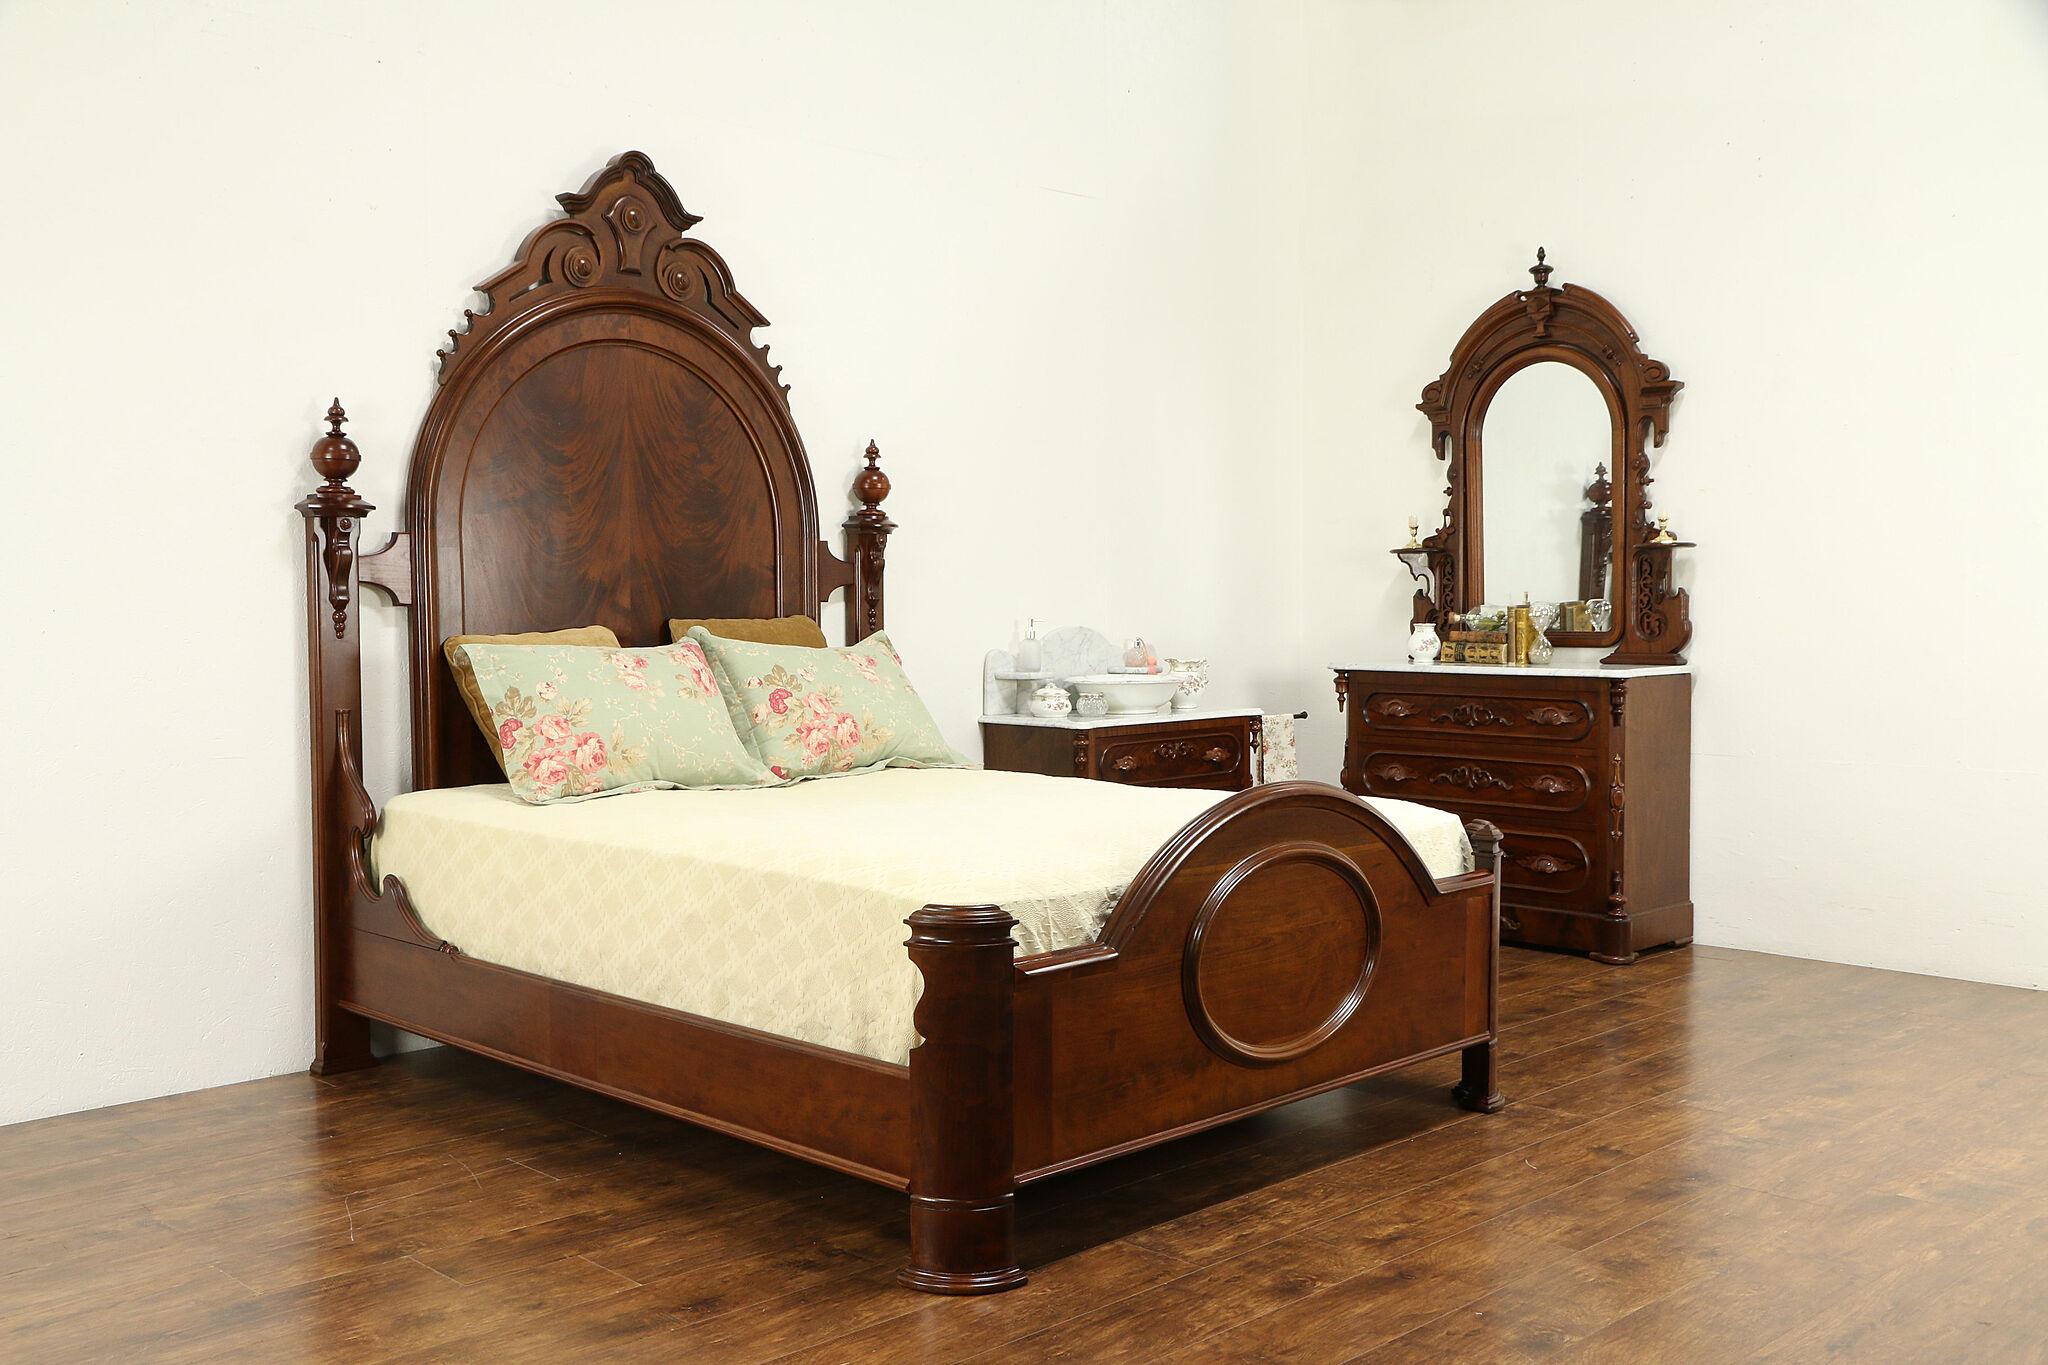 Sold Victorian Antique Cherry Mahogany Queen Size Bedroom Set